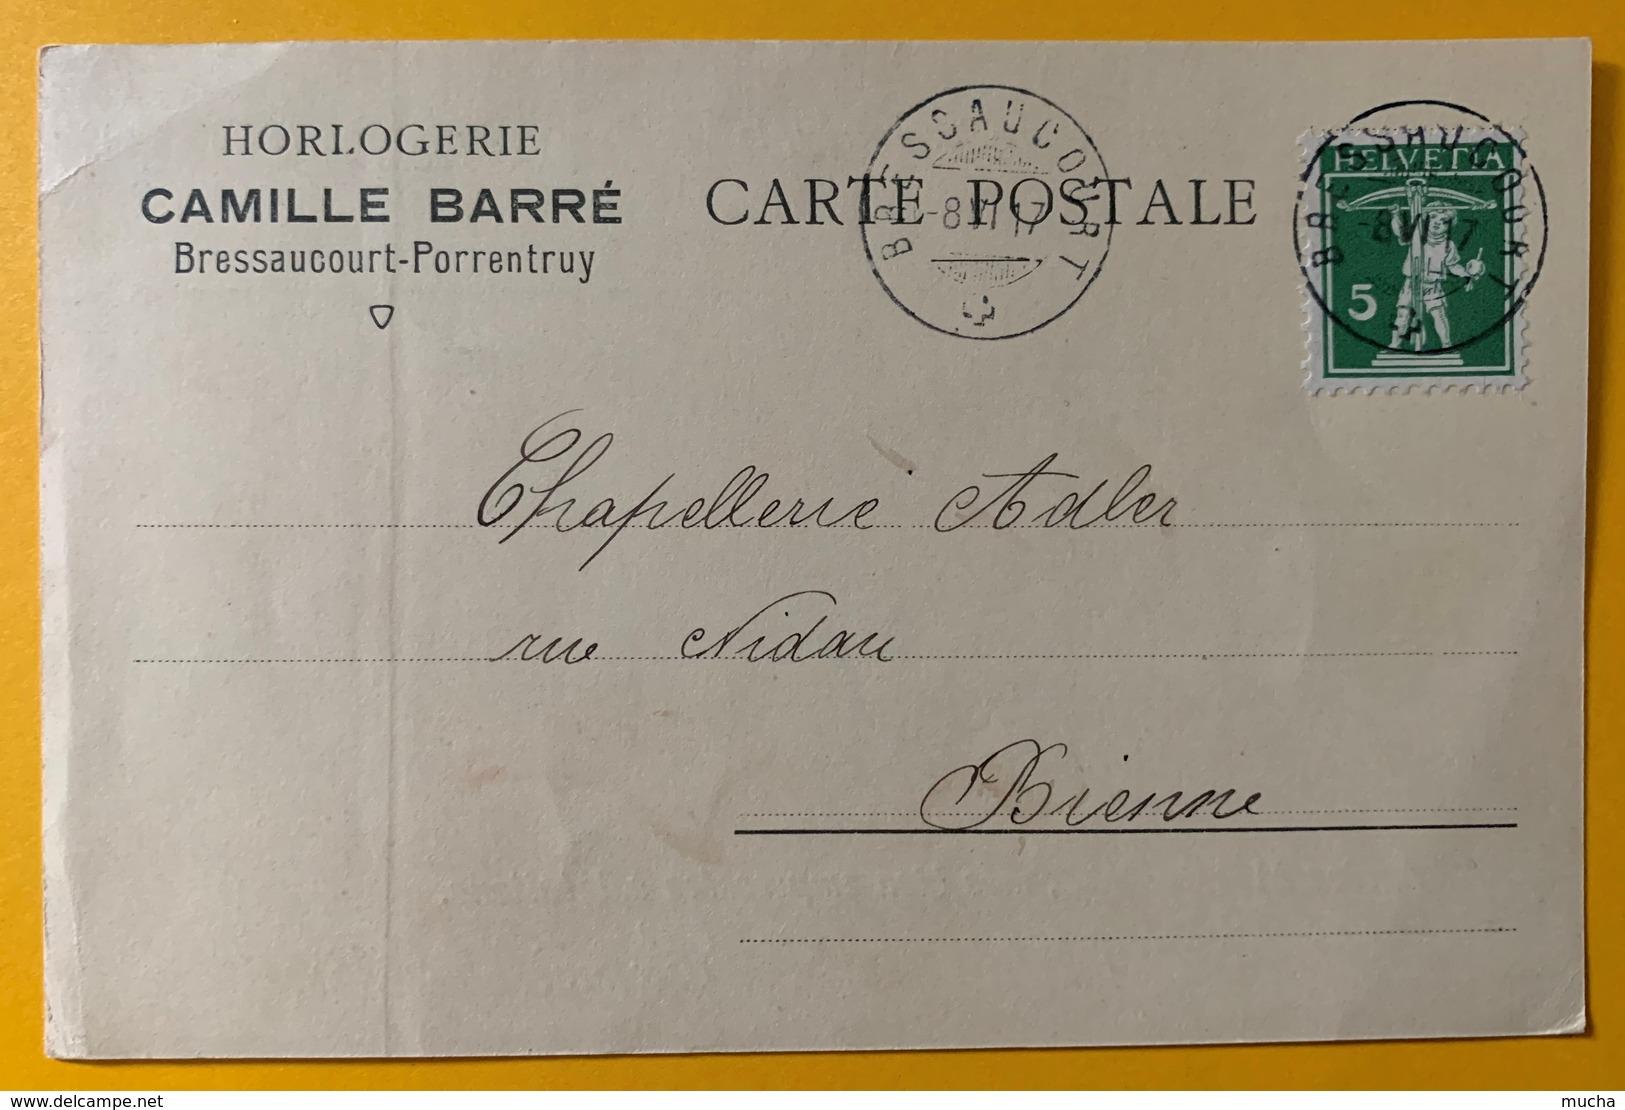 8625 - Horlogerie Camille Barré Bressaucourt-Porrentruy 1917 - JU Jura